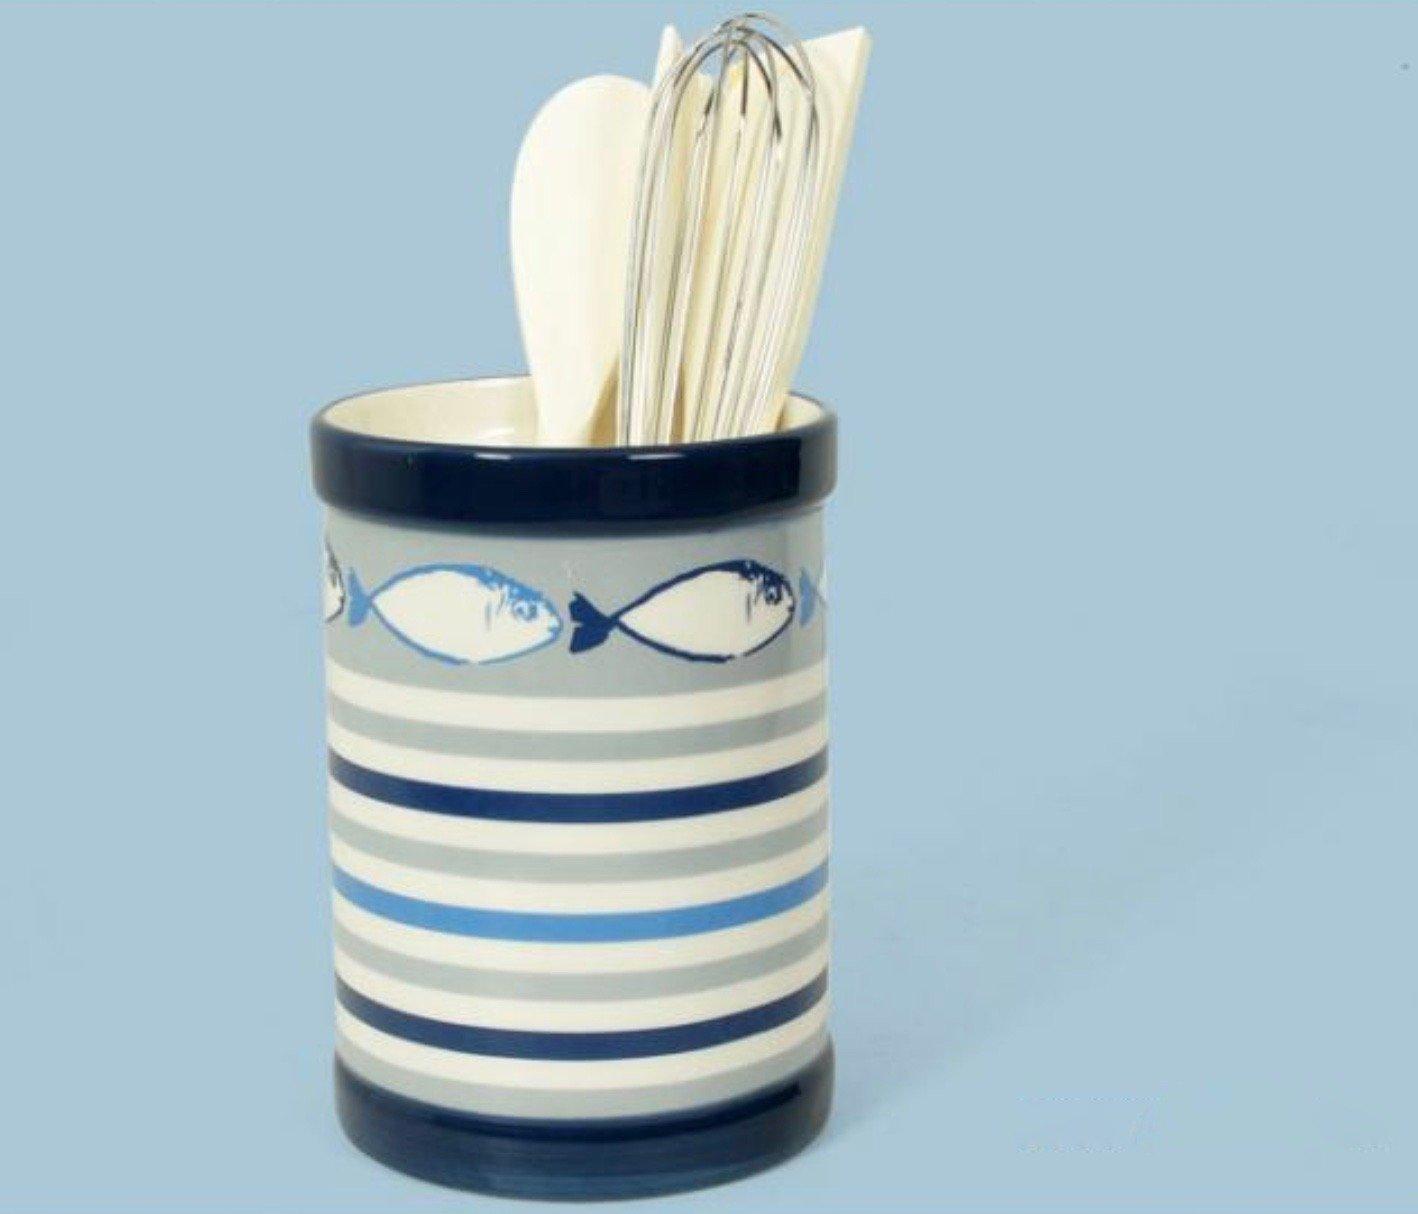 000643 Striped Ceramic Utensil Holder with Fish Design and Kitchen Utensils